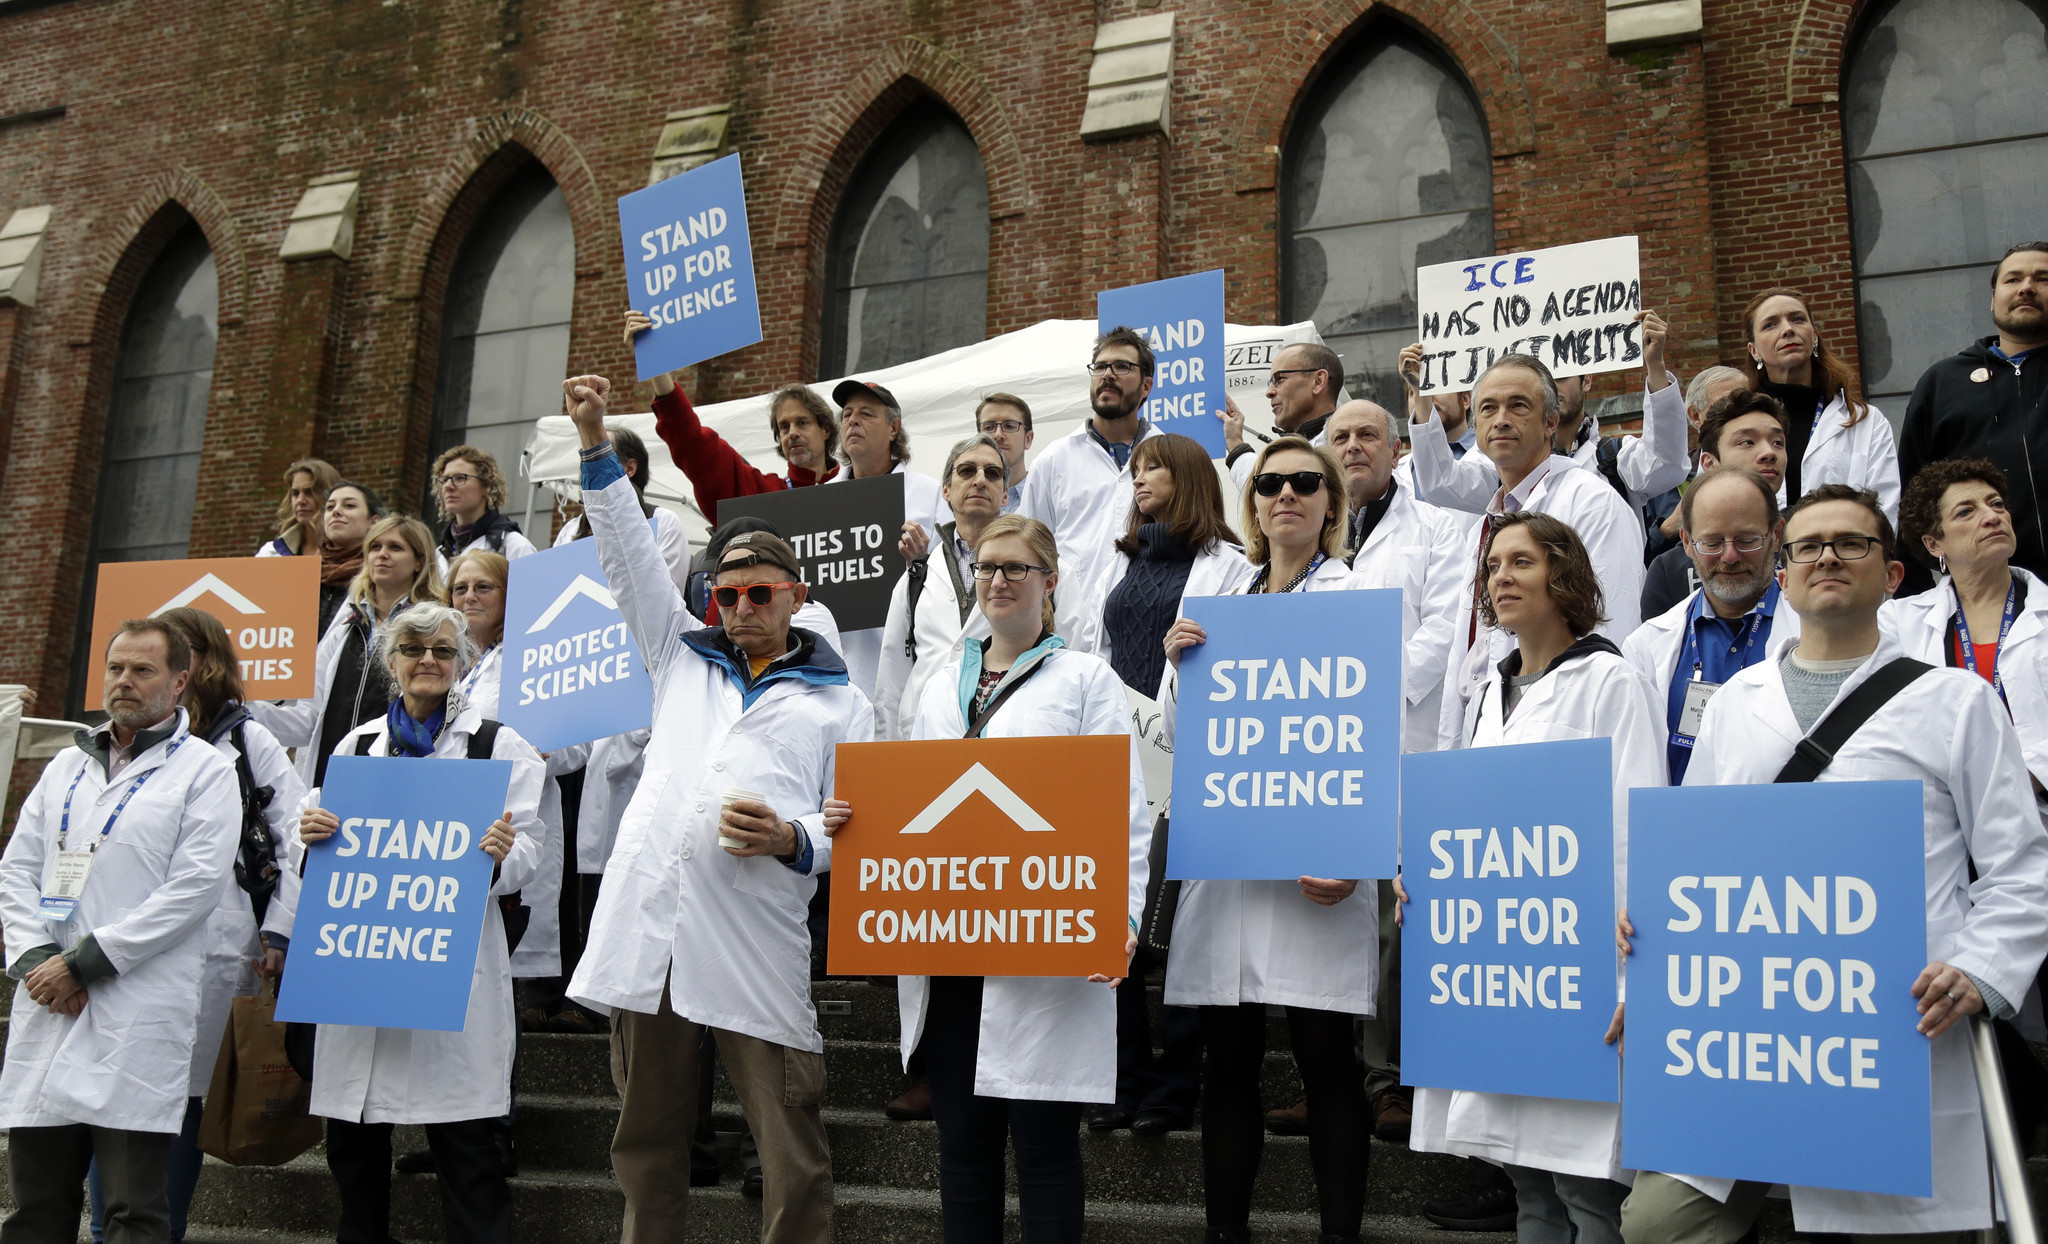 Break science resistance march download